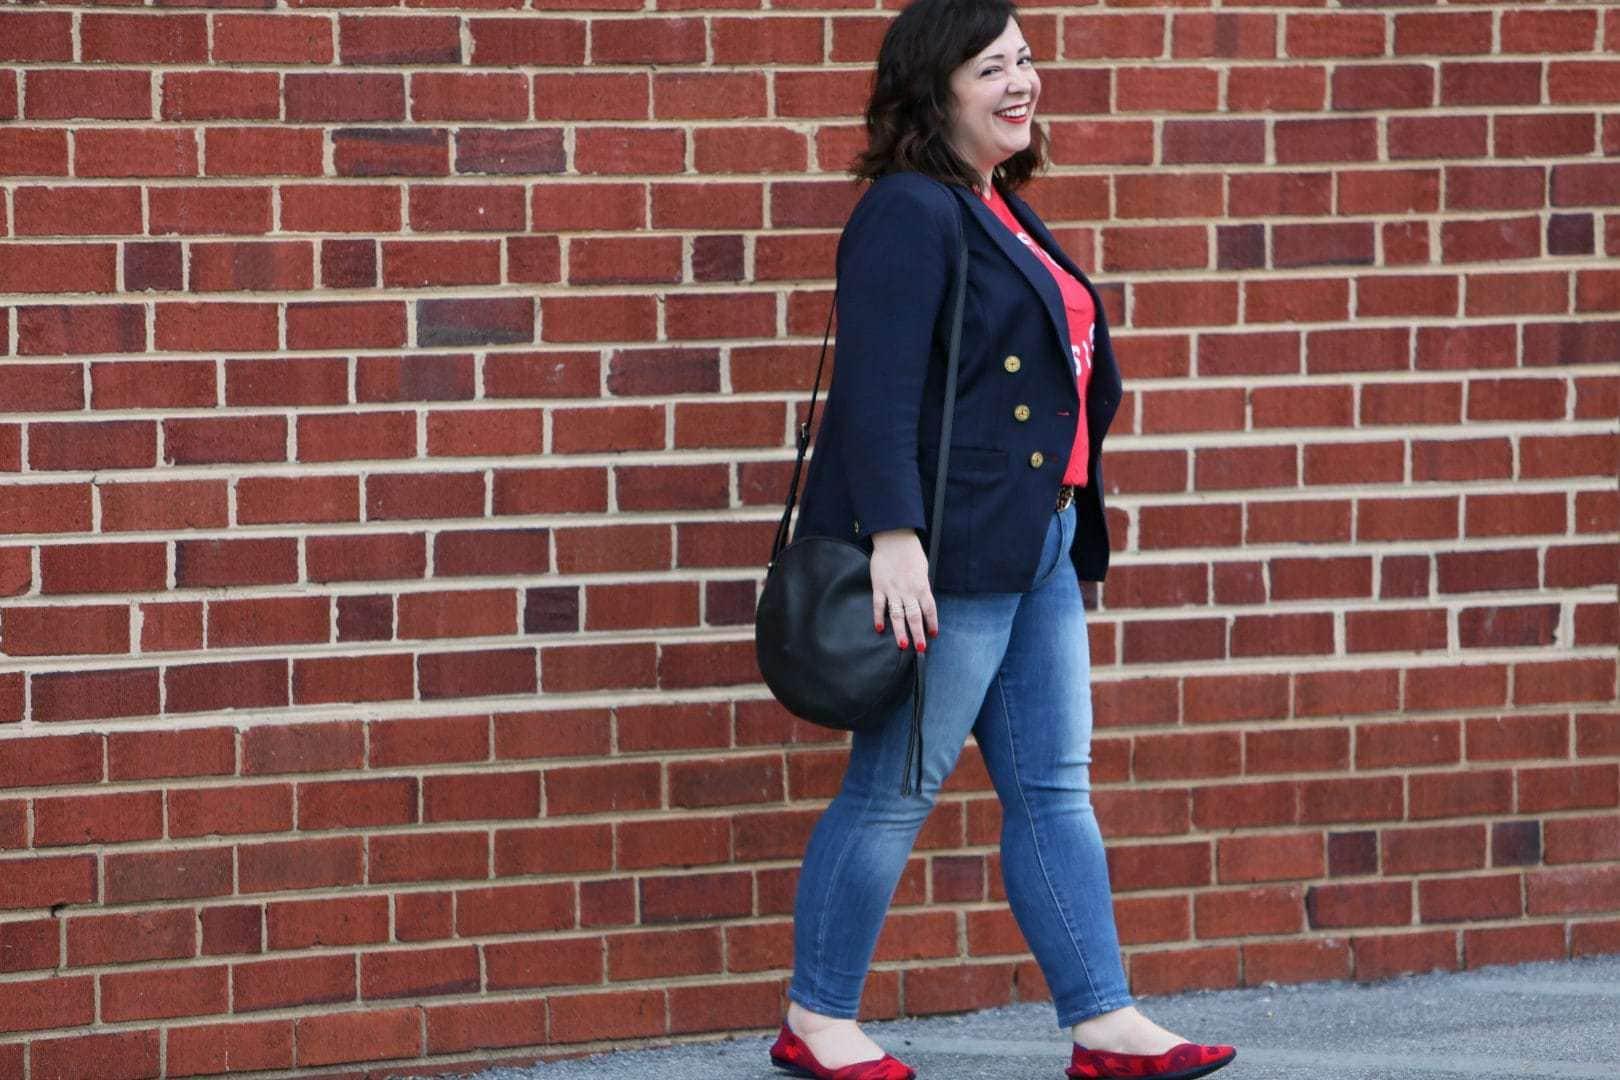 over 40 fashion blog 2